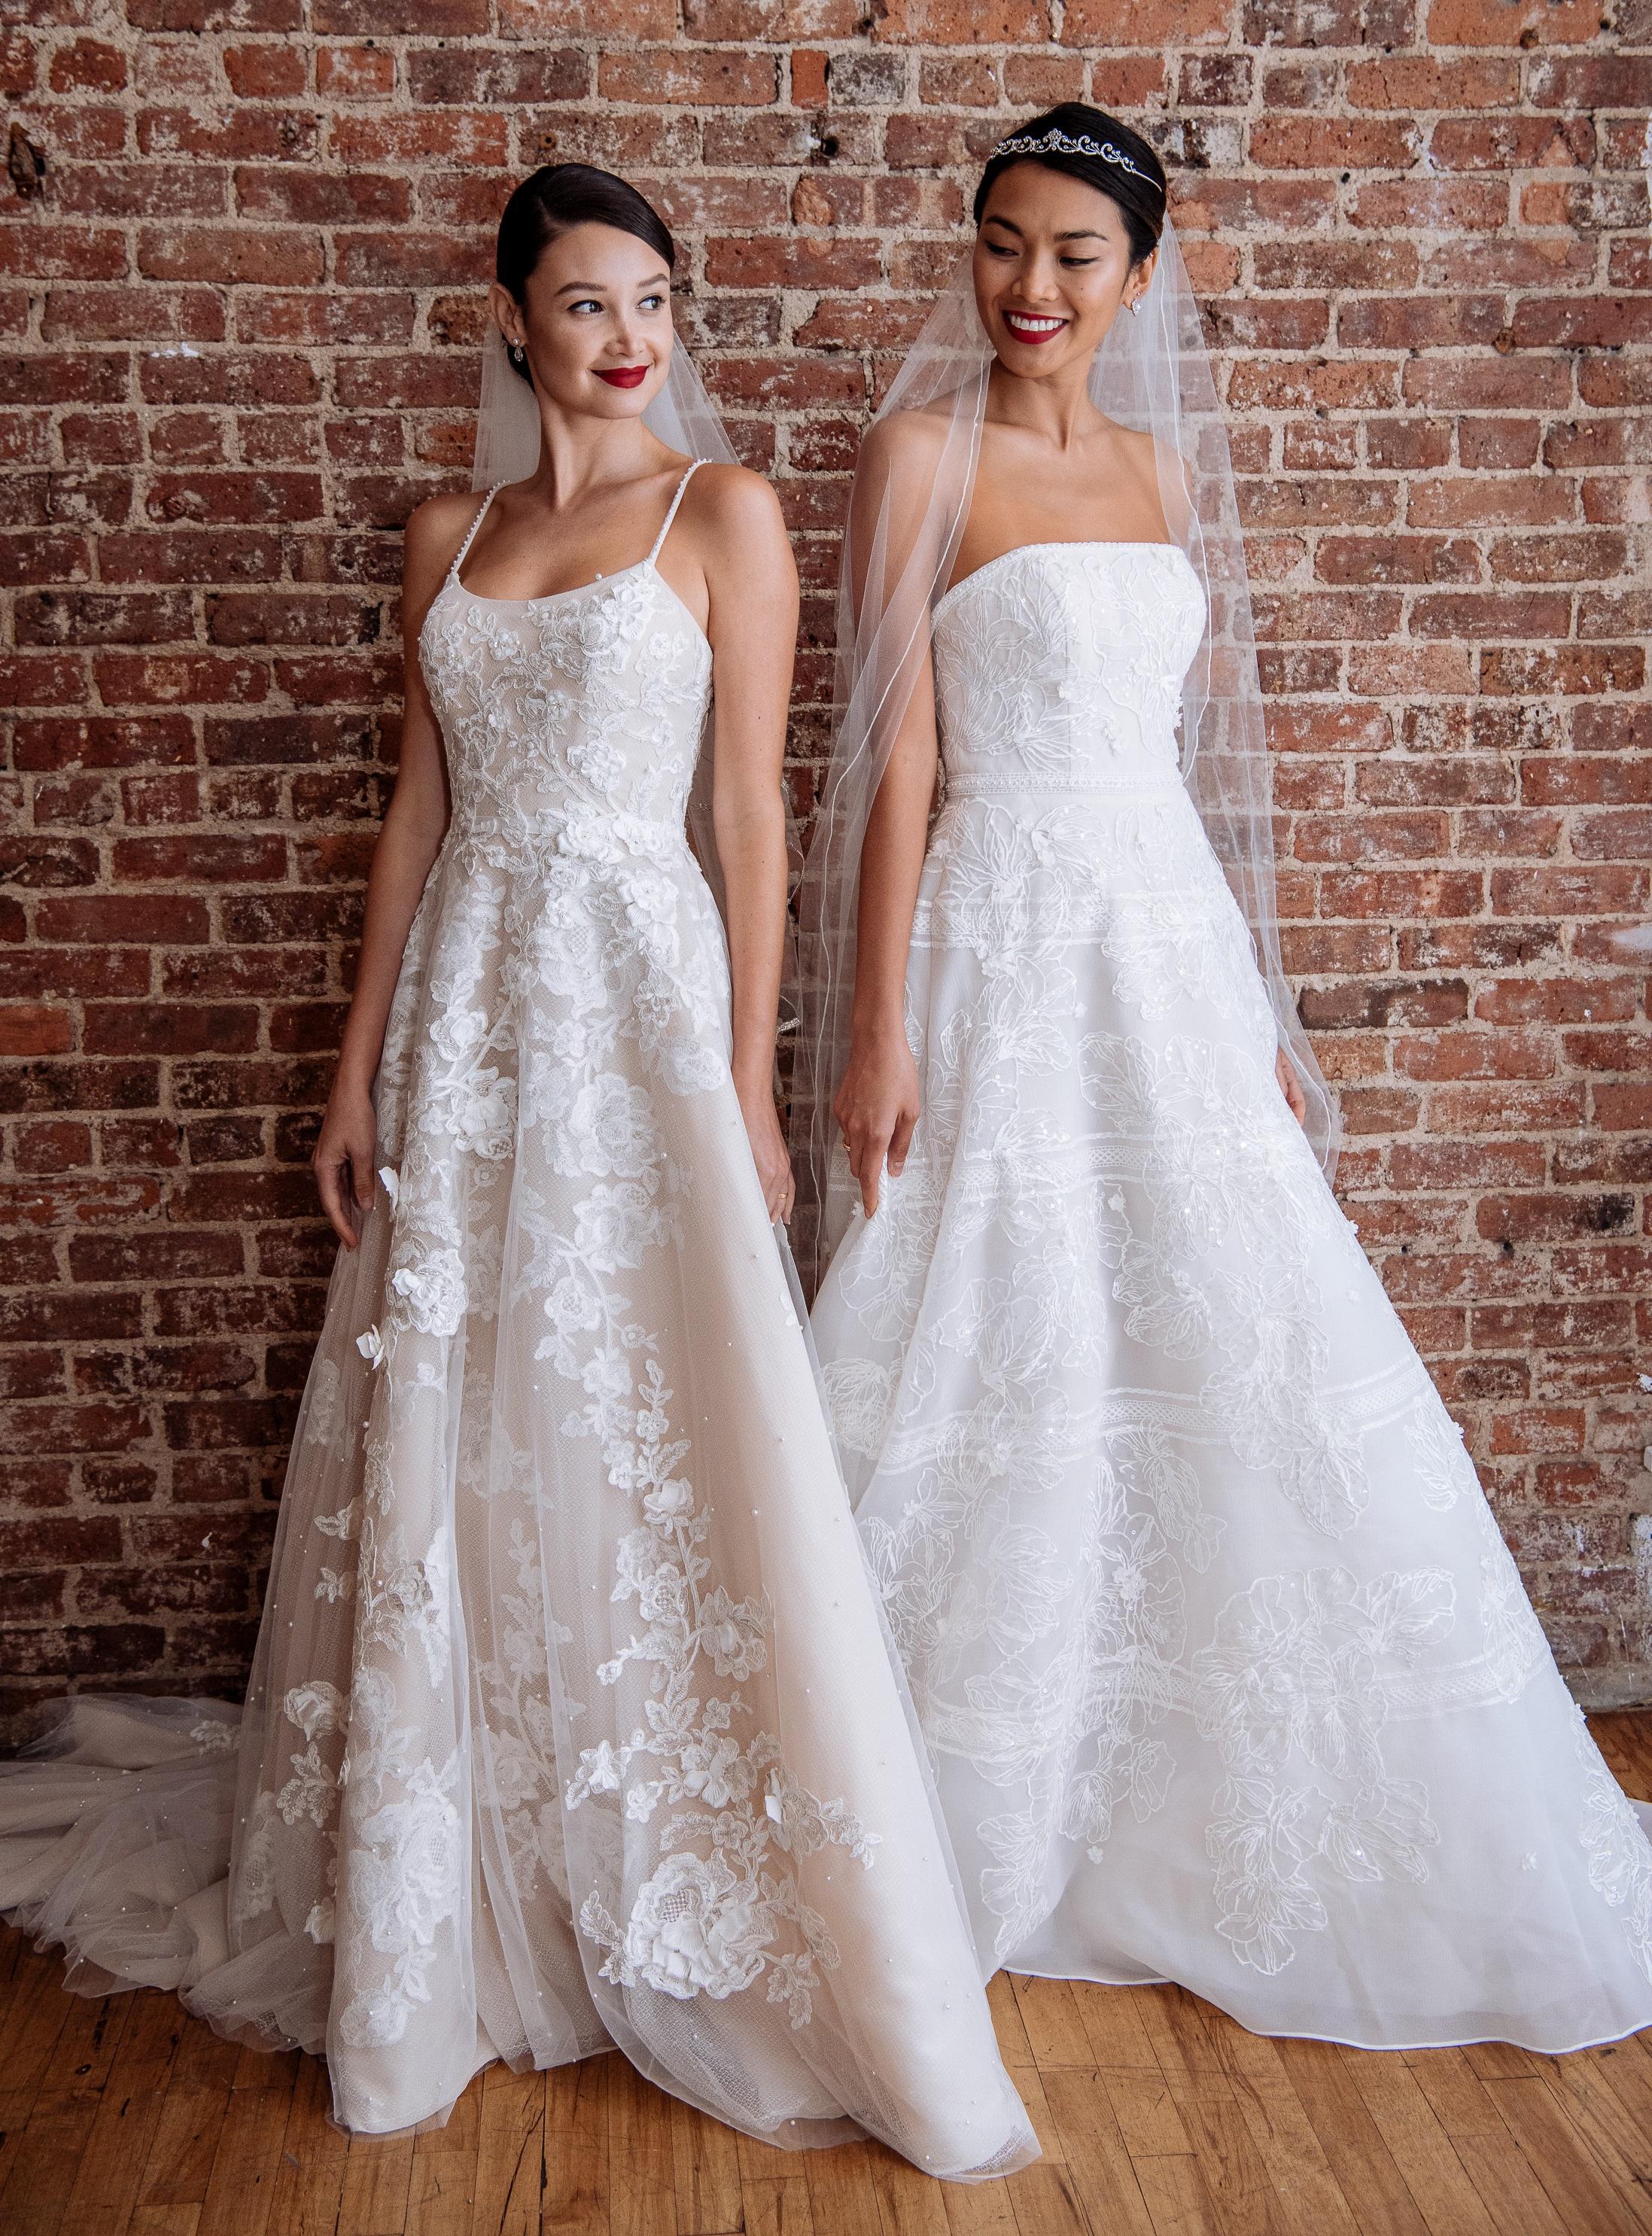 2019 Spring Wedding Dresses | Transparent Wedding Dress Details